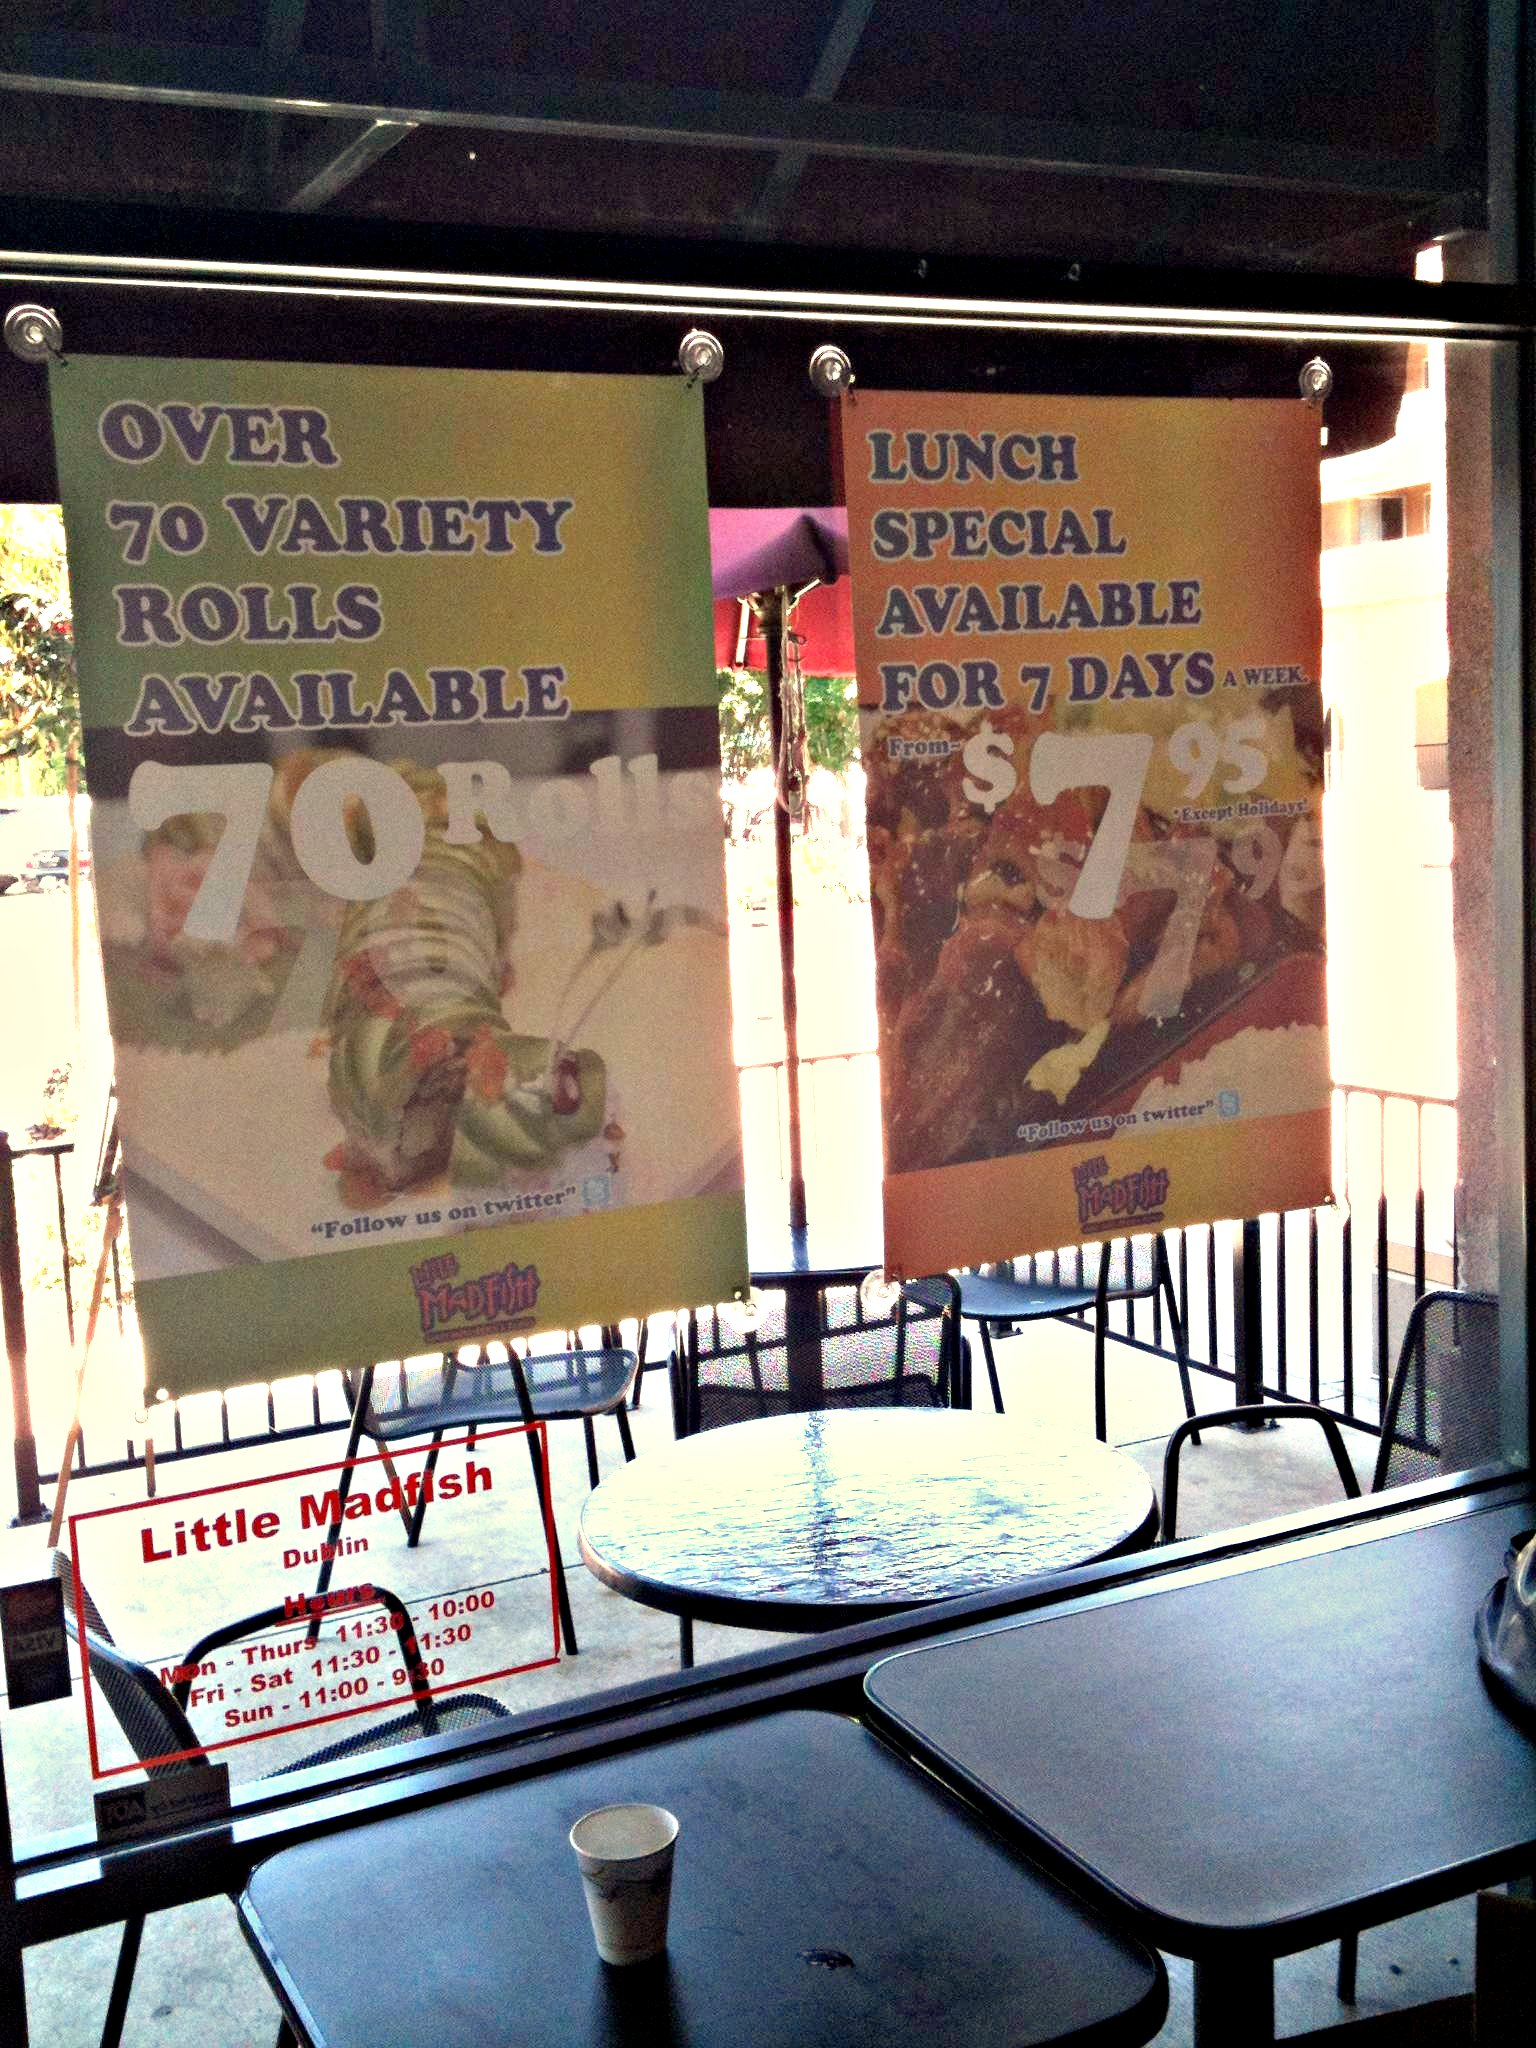 Little madfish restaurant window ads turned backwards for Mad fish restaurant